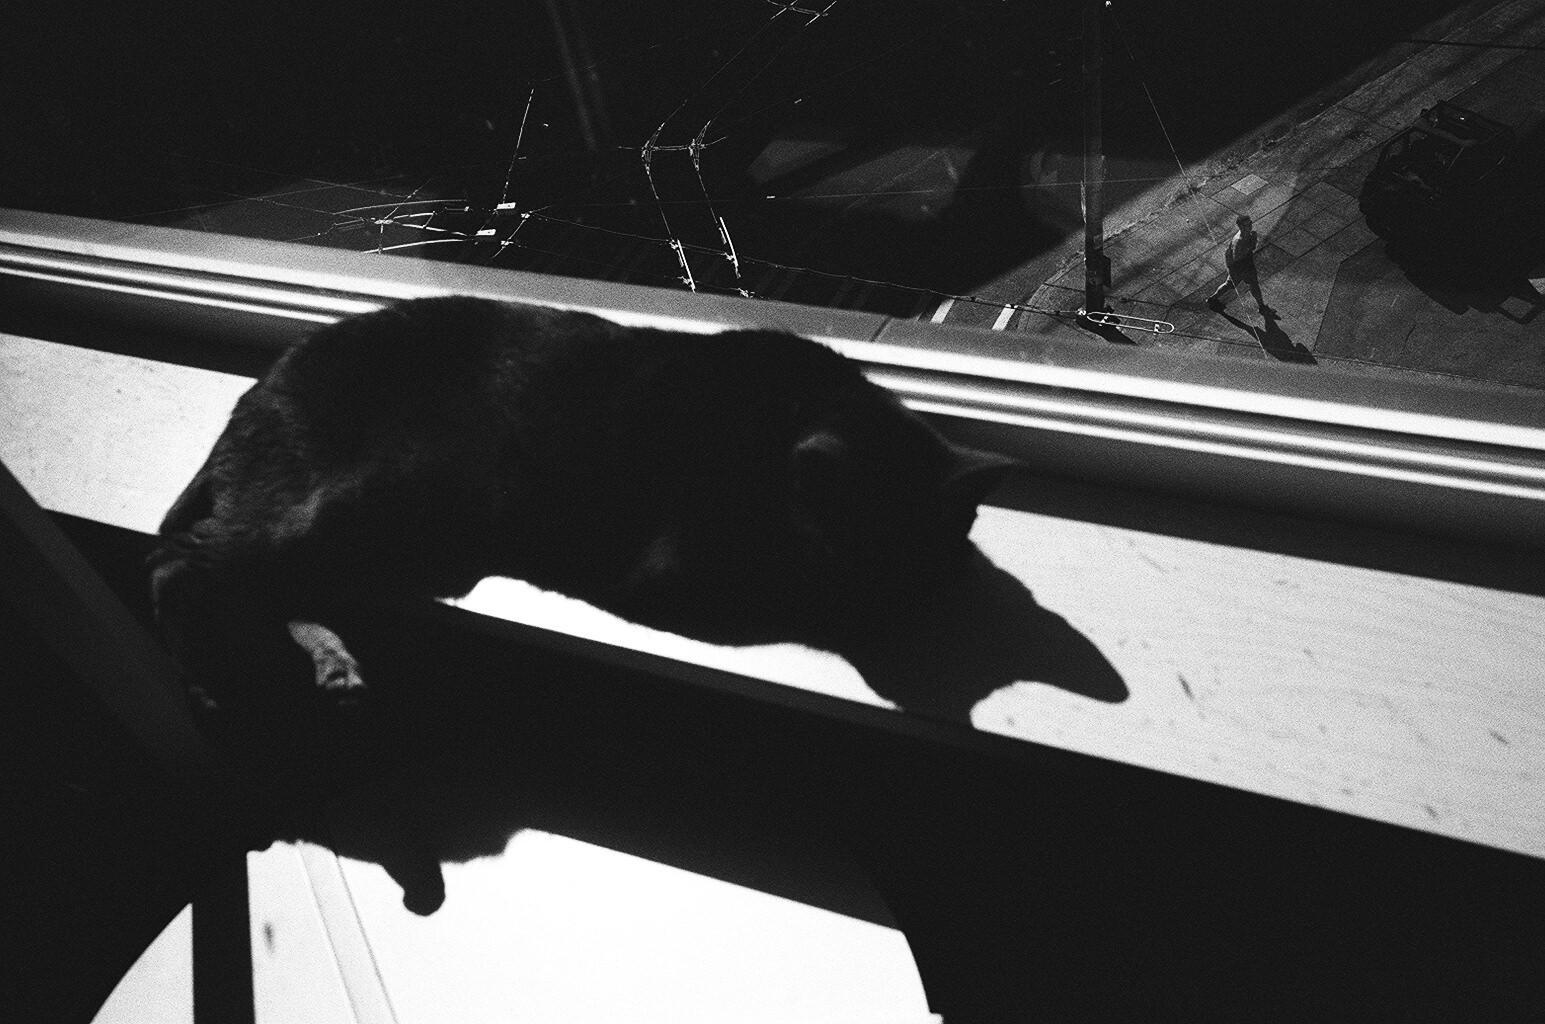 Eric kim black and white film photography Trix 1600 2015 Europe -023.jpg